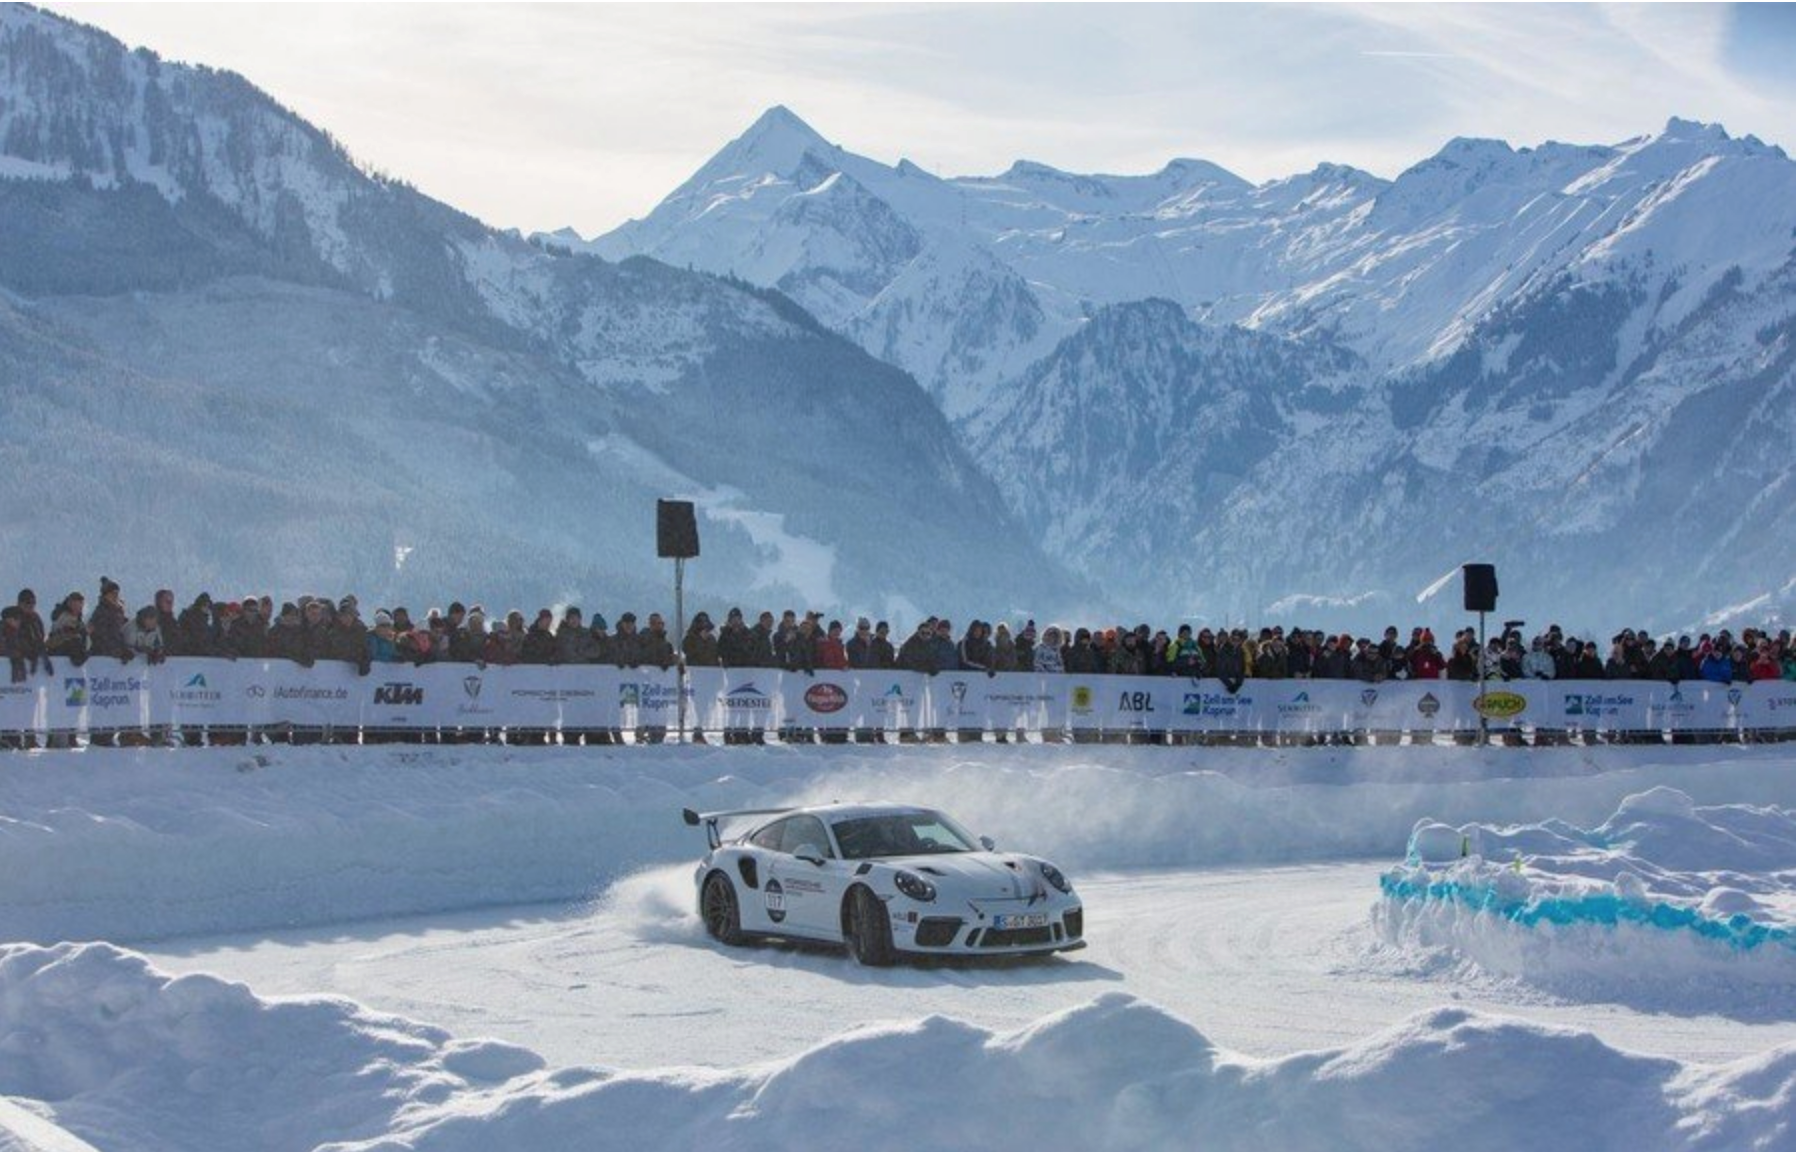 GP ICE RACE is back in Zell am See-Kaprun, CHOOOSE